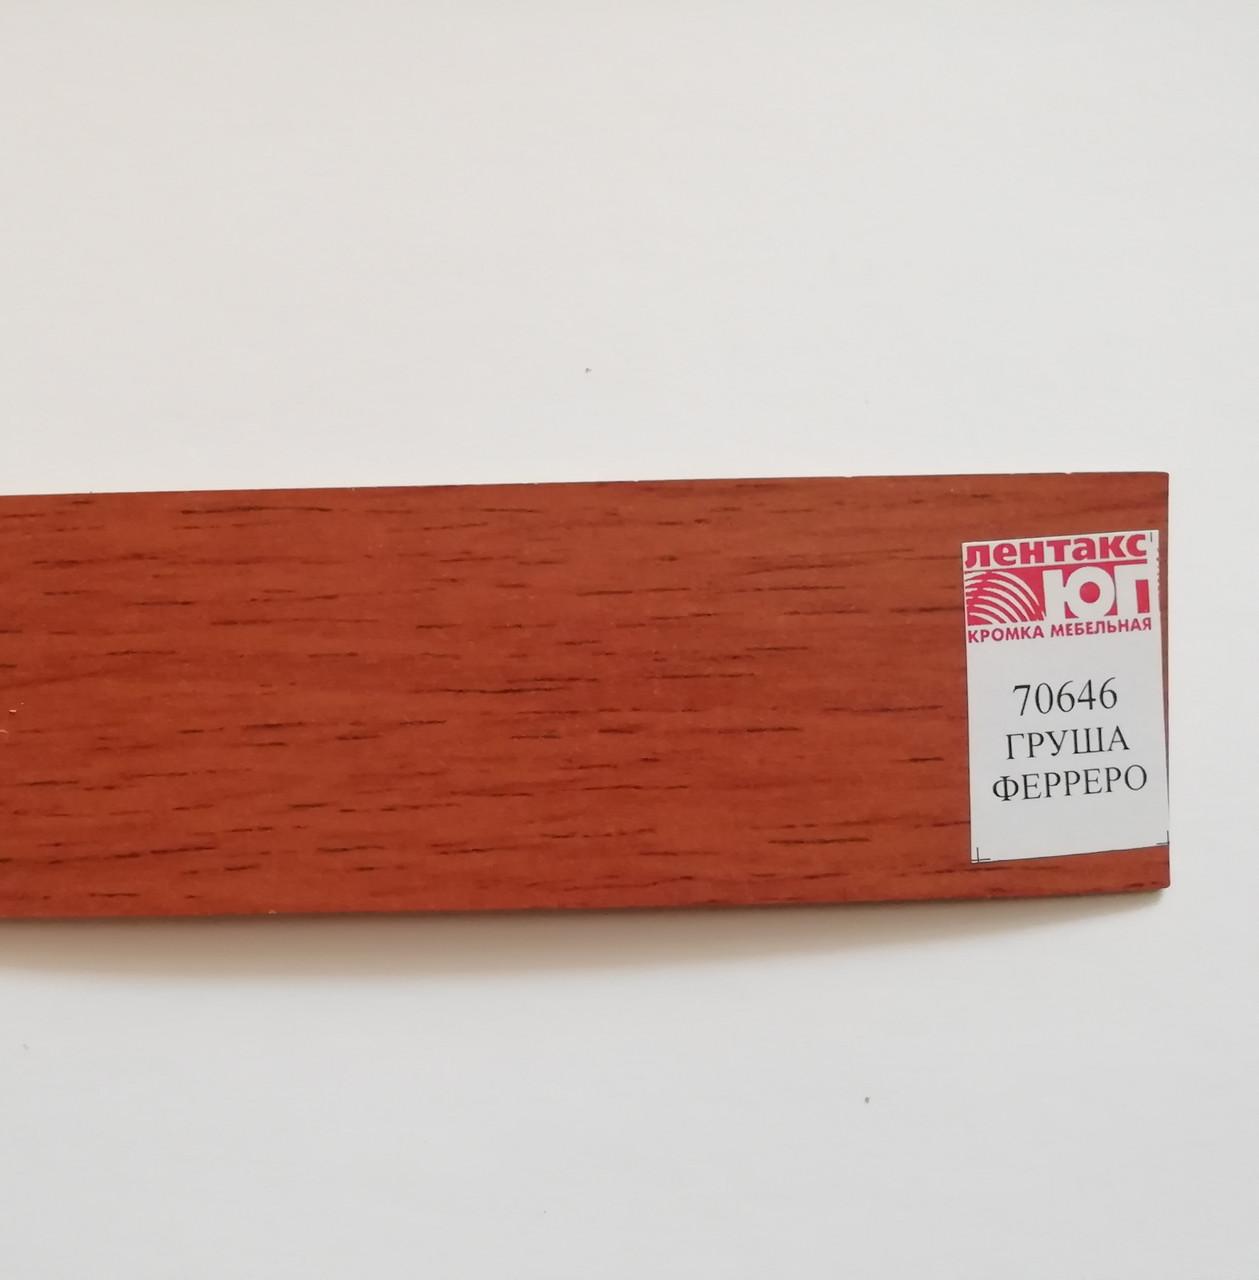 Паперова крайка (кромка) з клеєм груша ферреро